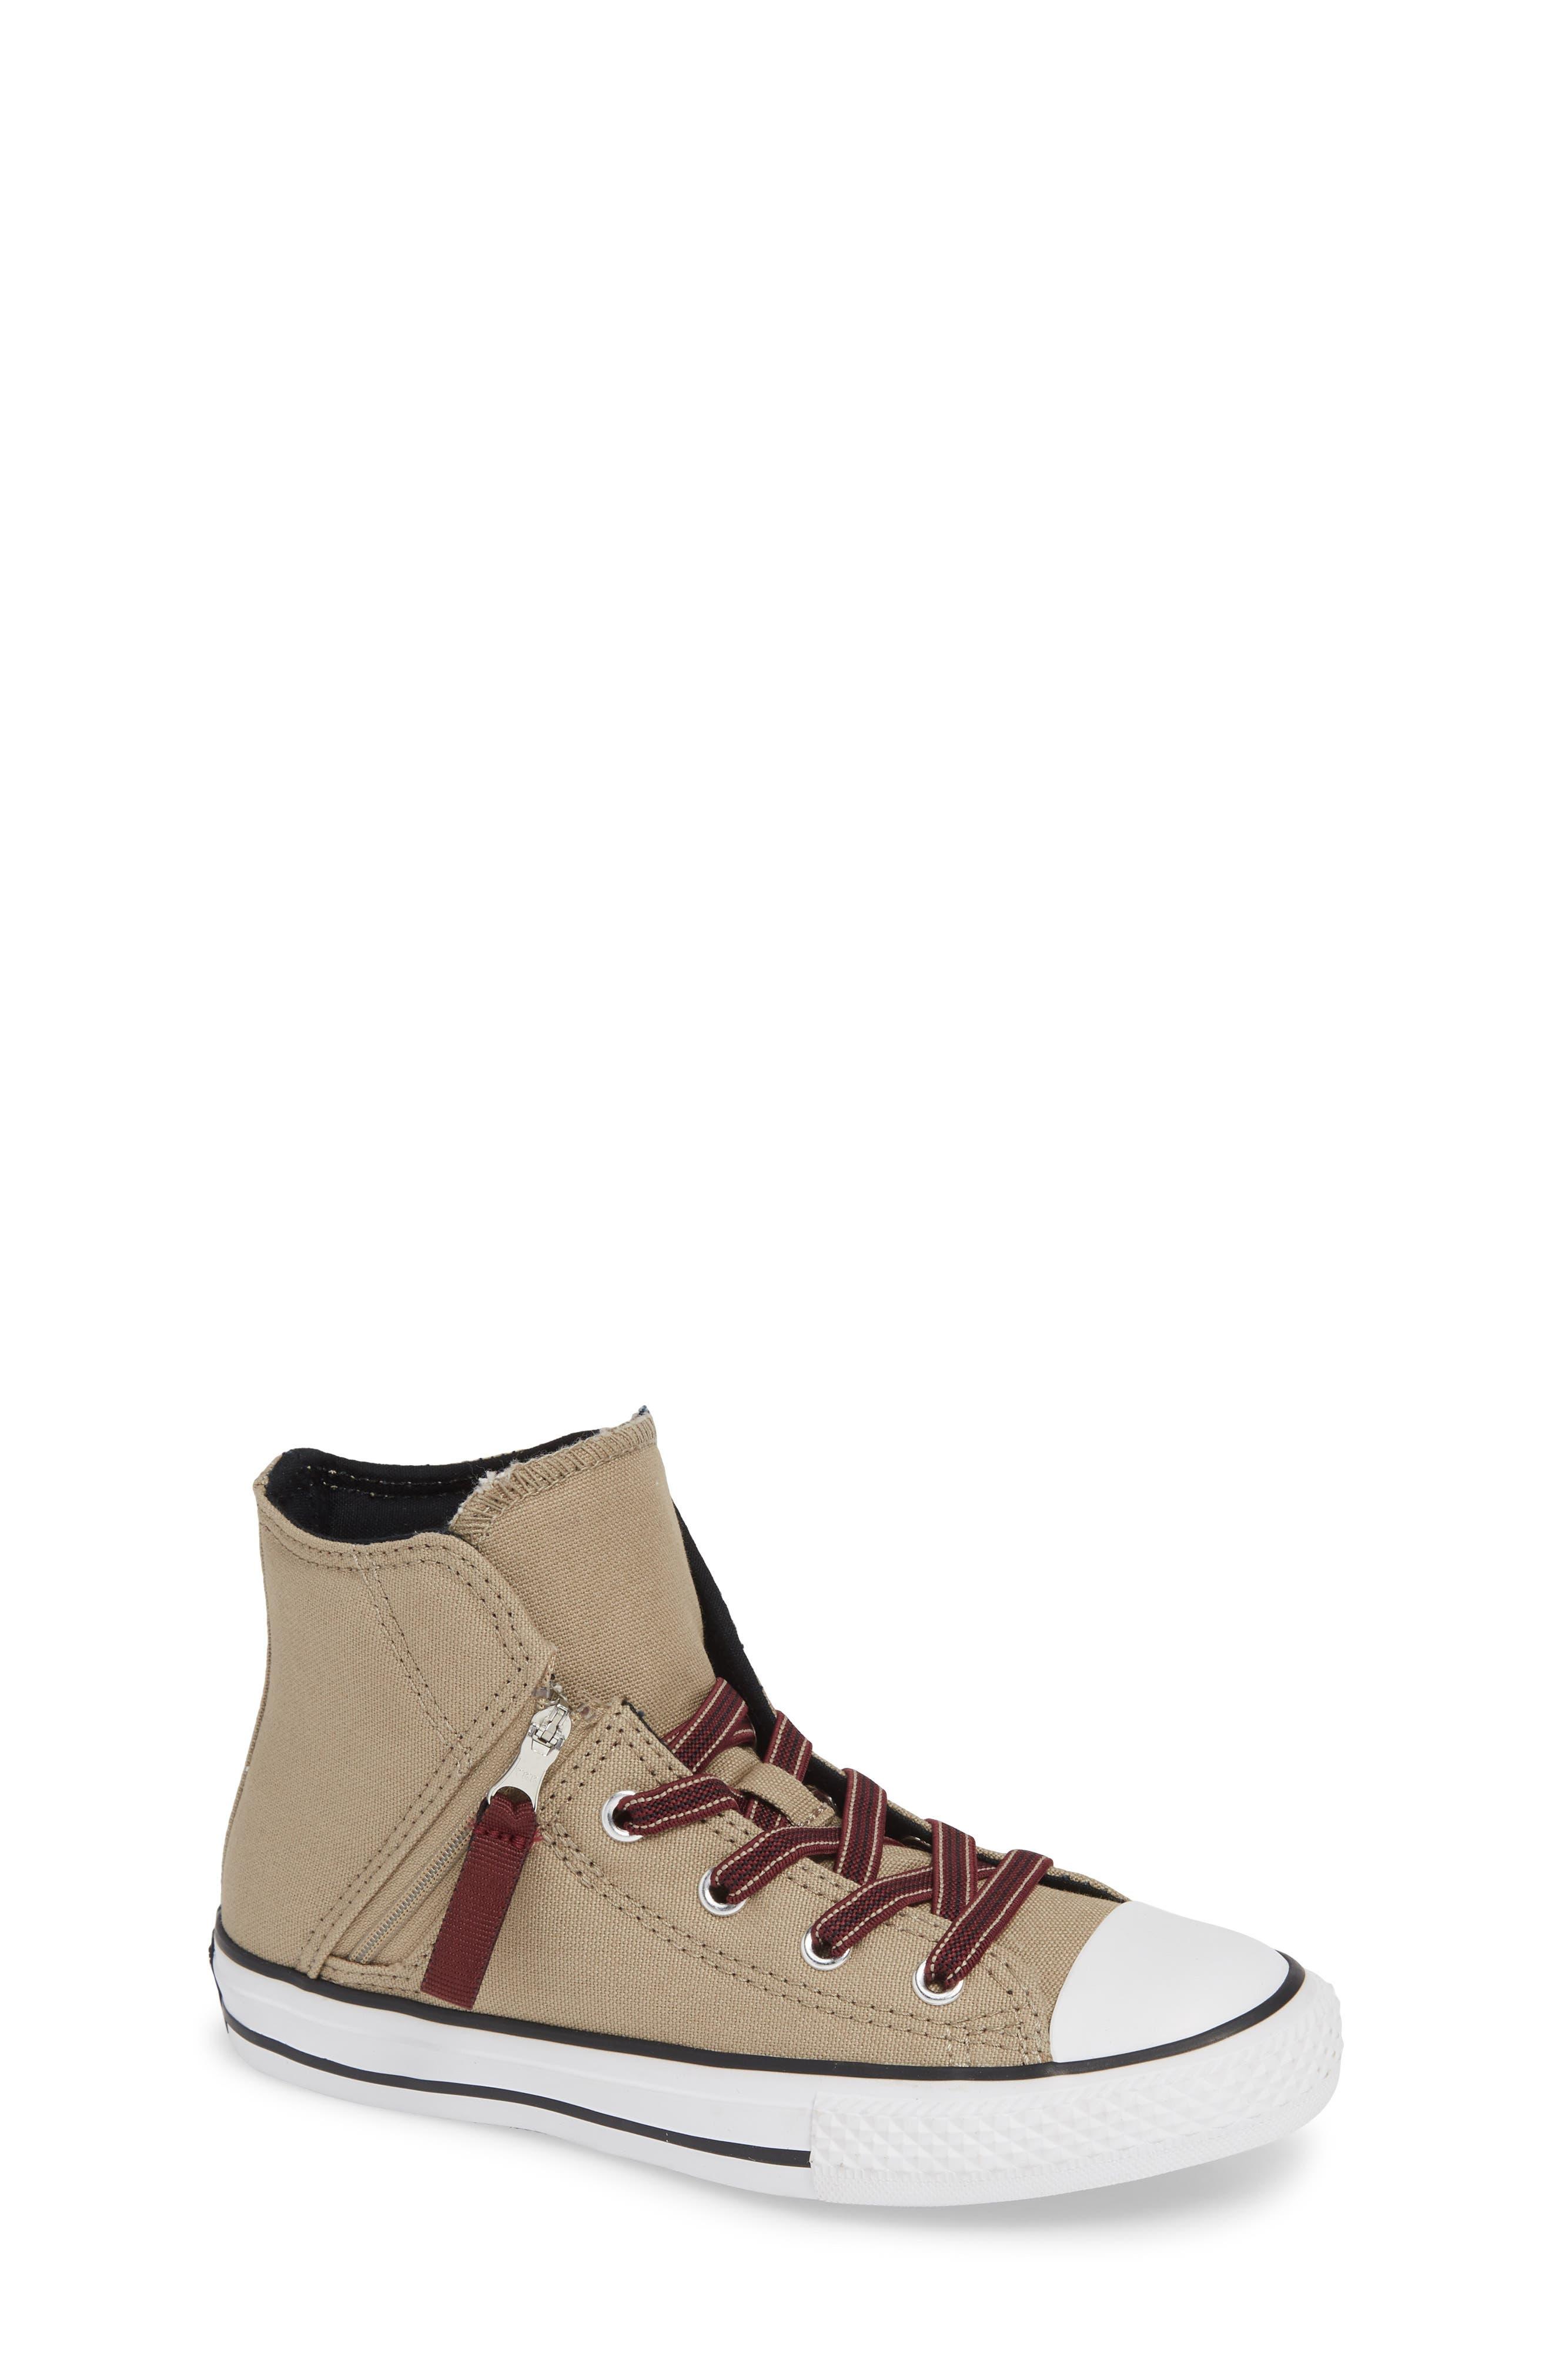 Chuck Taylor<sup>®</sup> All Star<sup>®</sup> Pull Zip High Top Sneaker,                             Main thumbnail 1, color,                             KHAKI